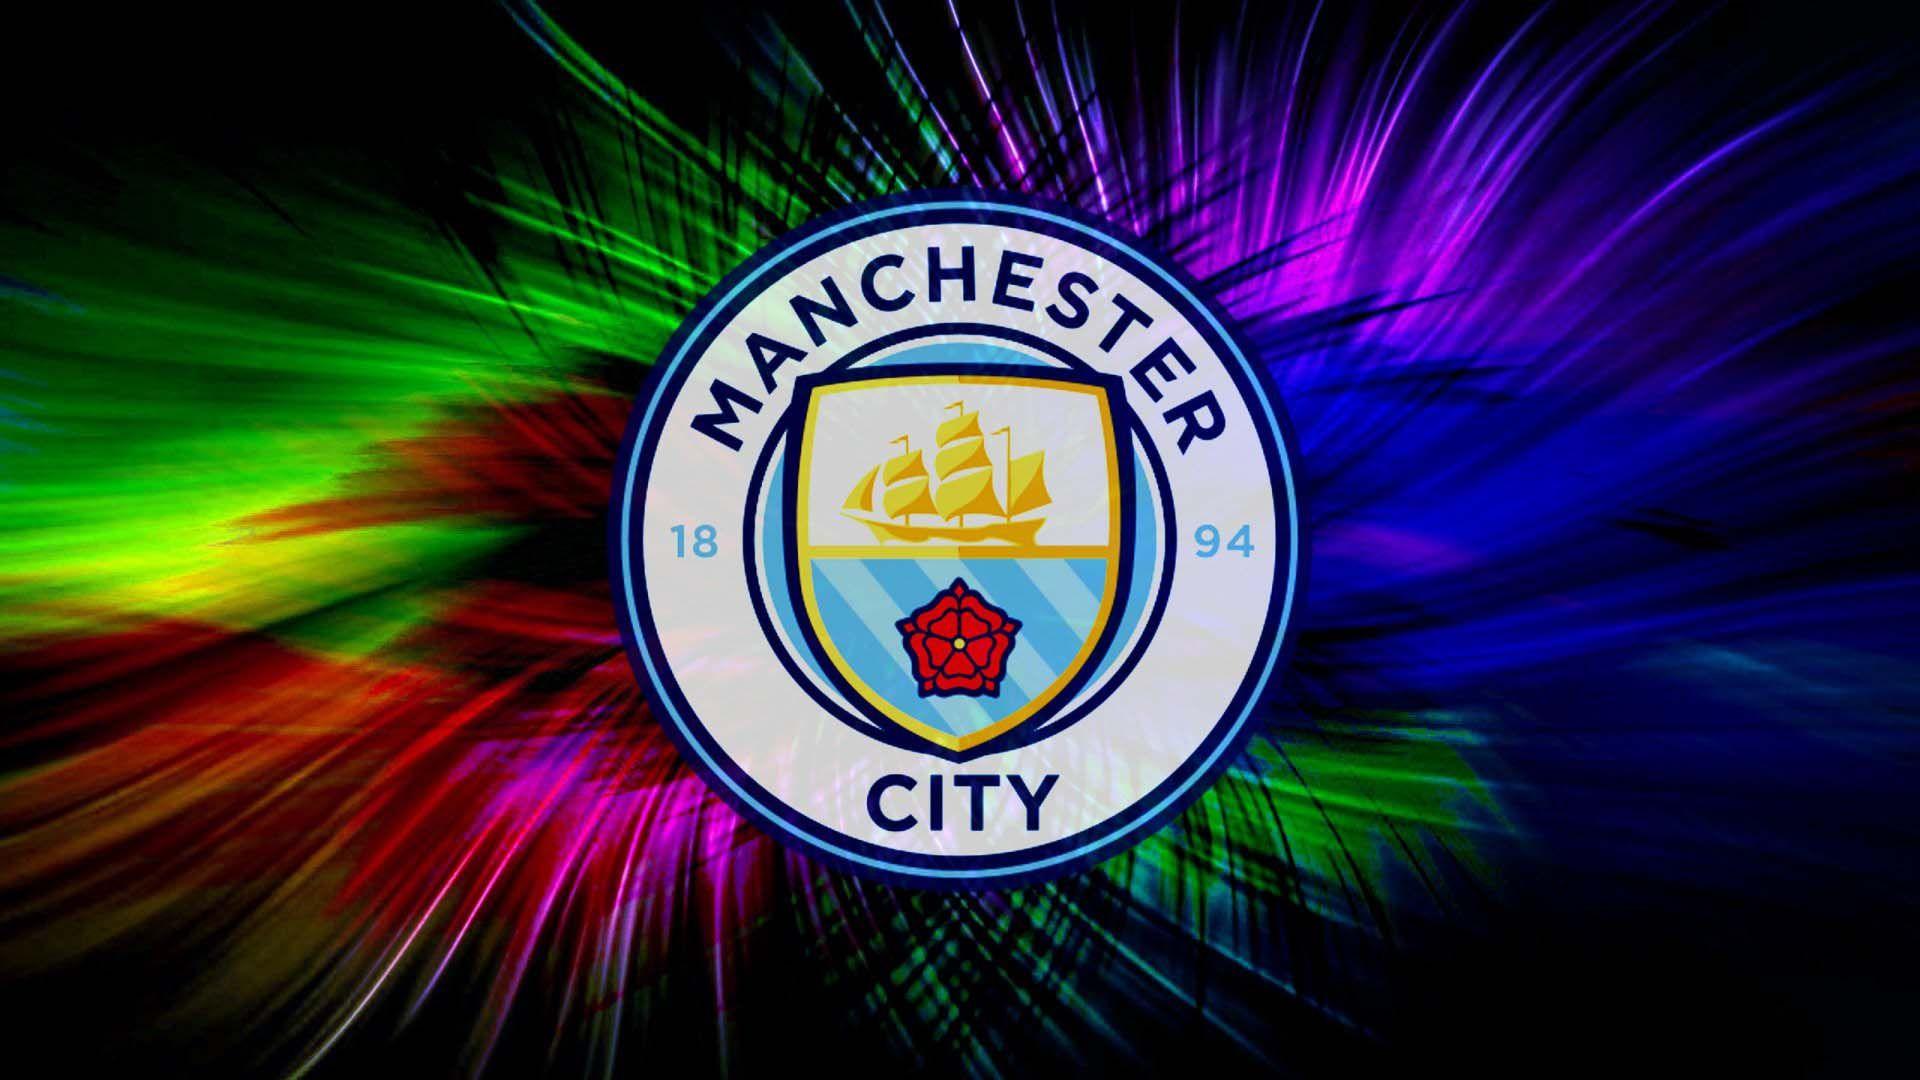 Manchester City pc wallpaper